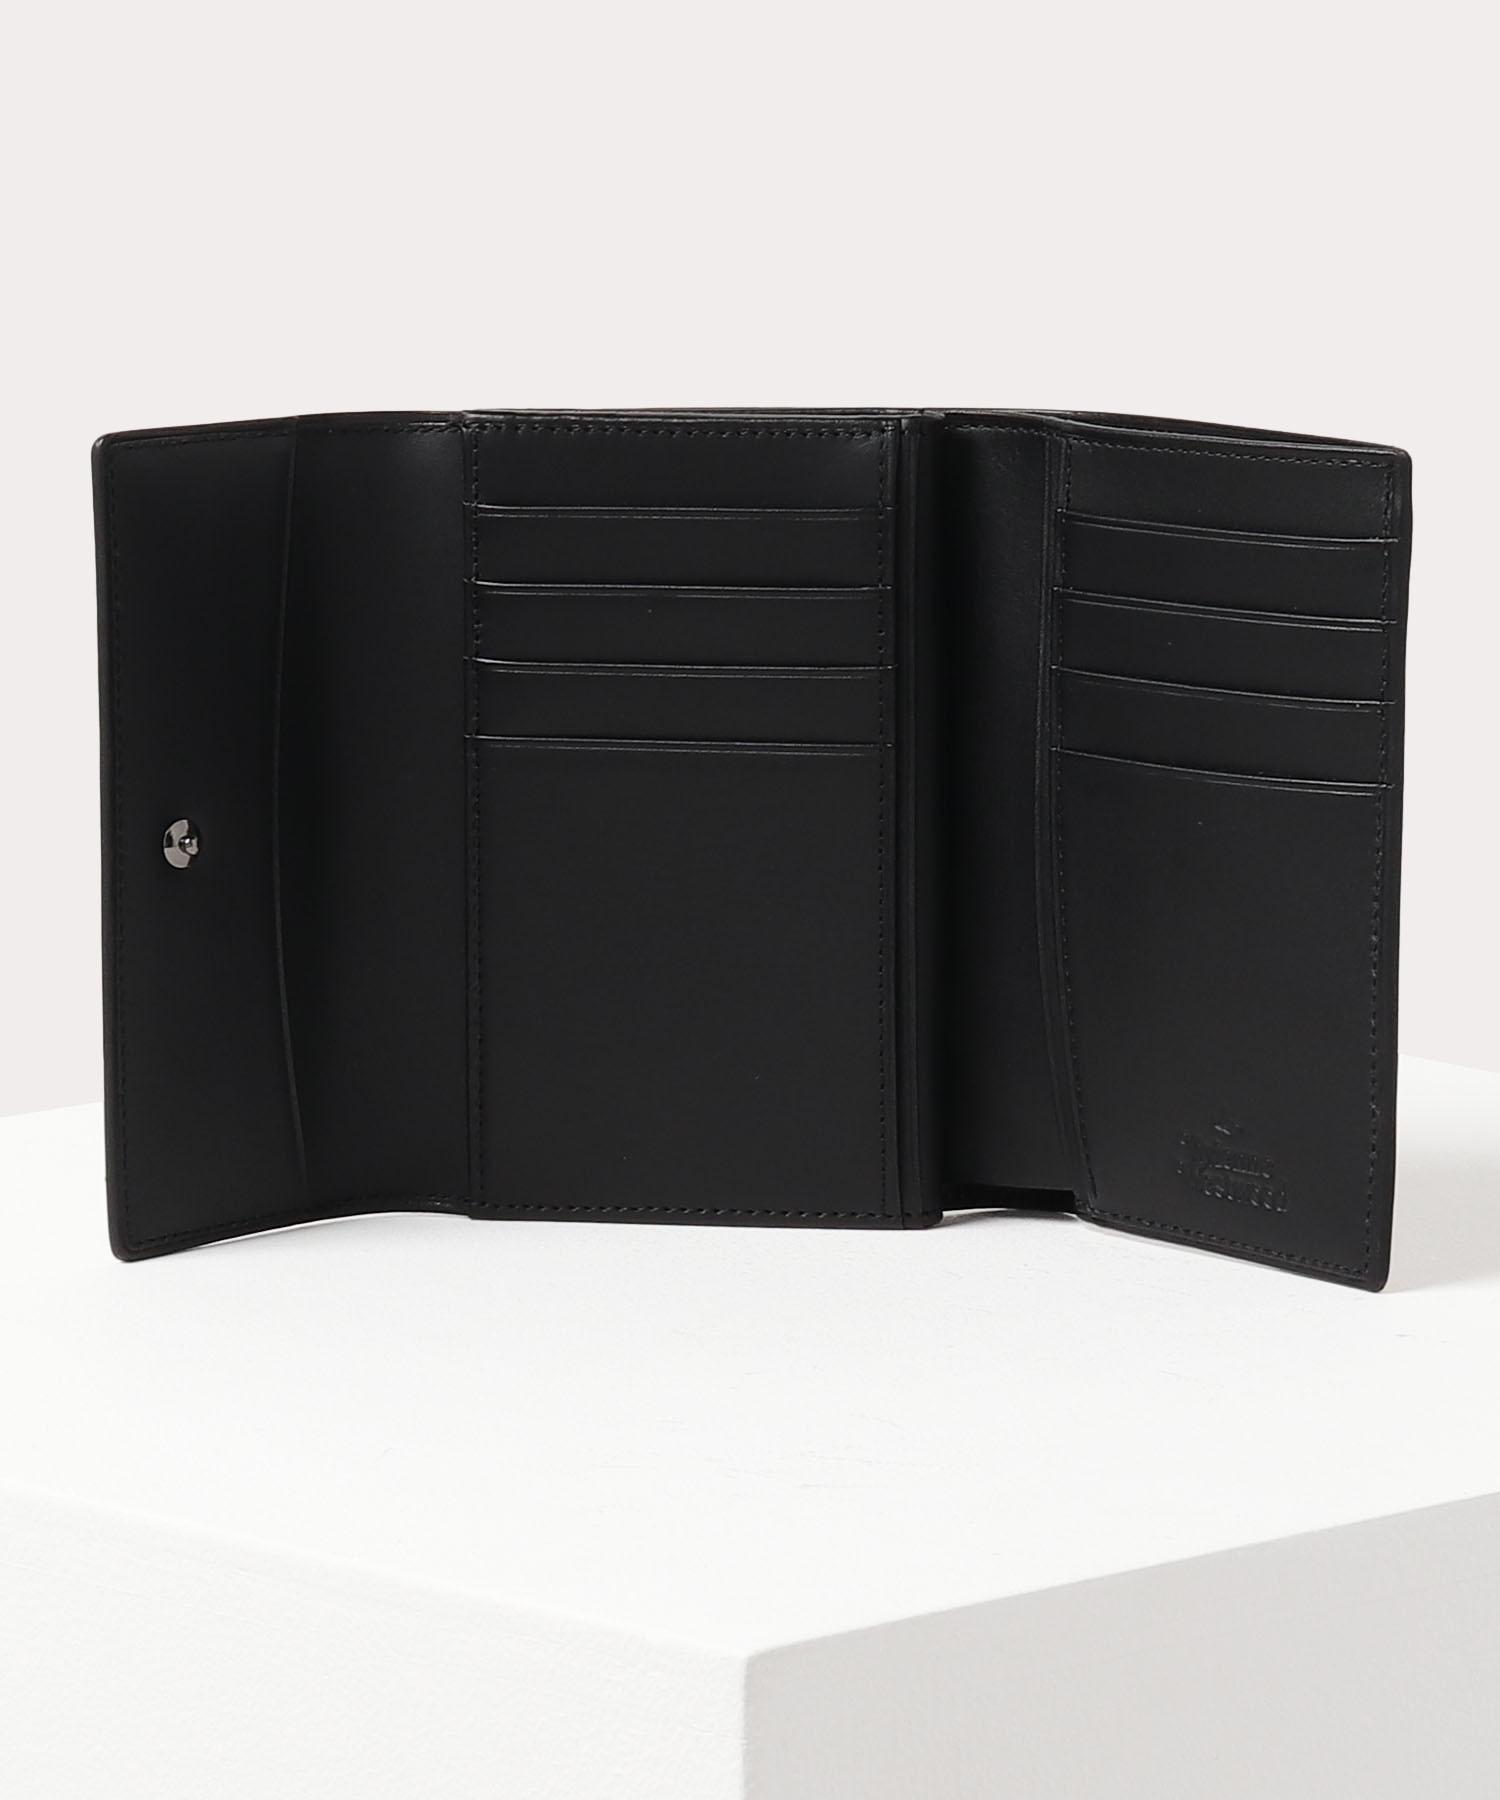 ORBリピート 口金二つ折り財布